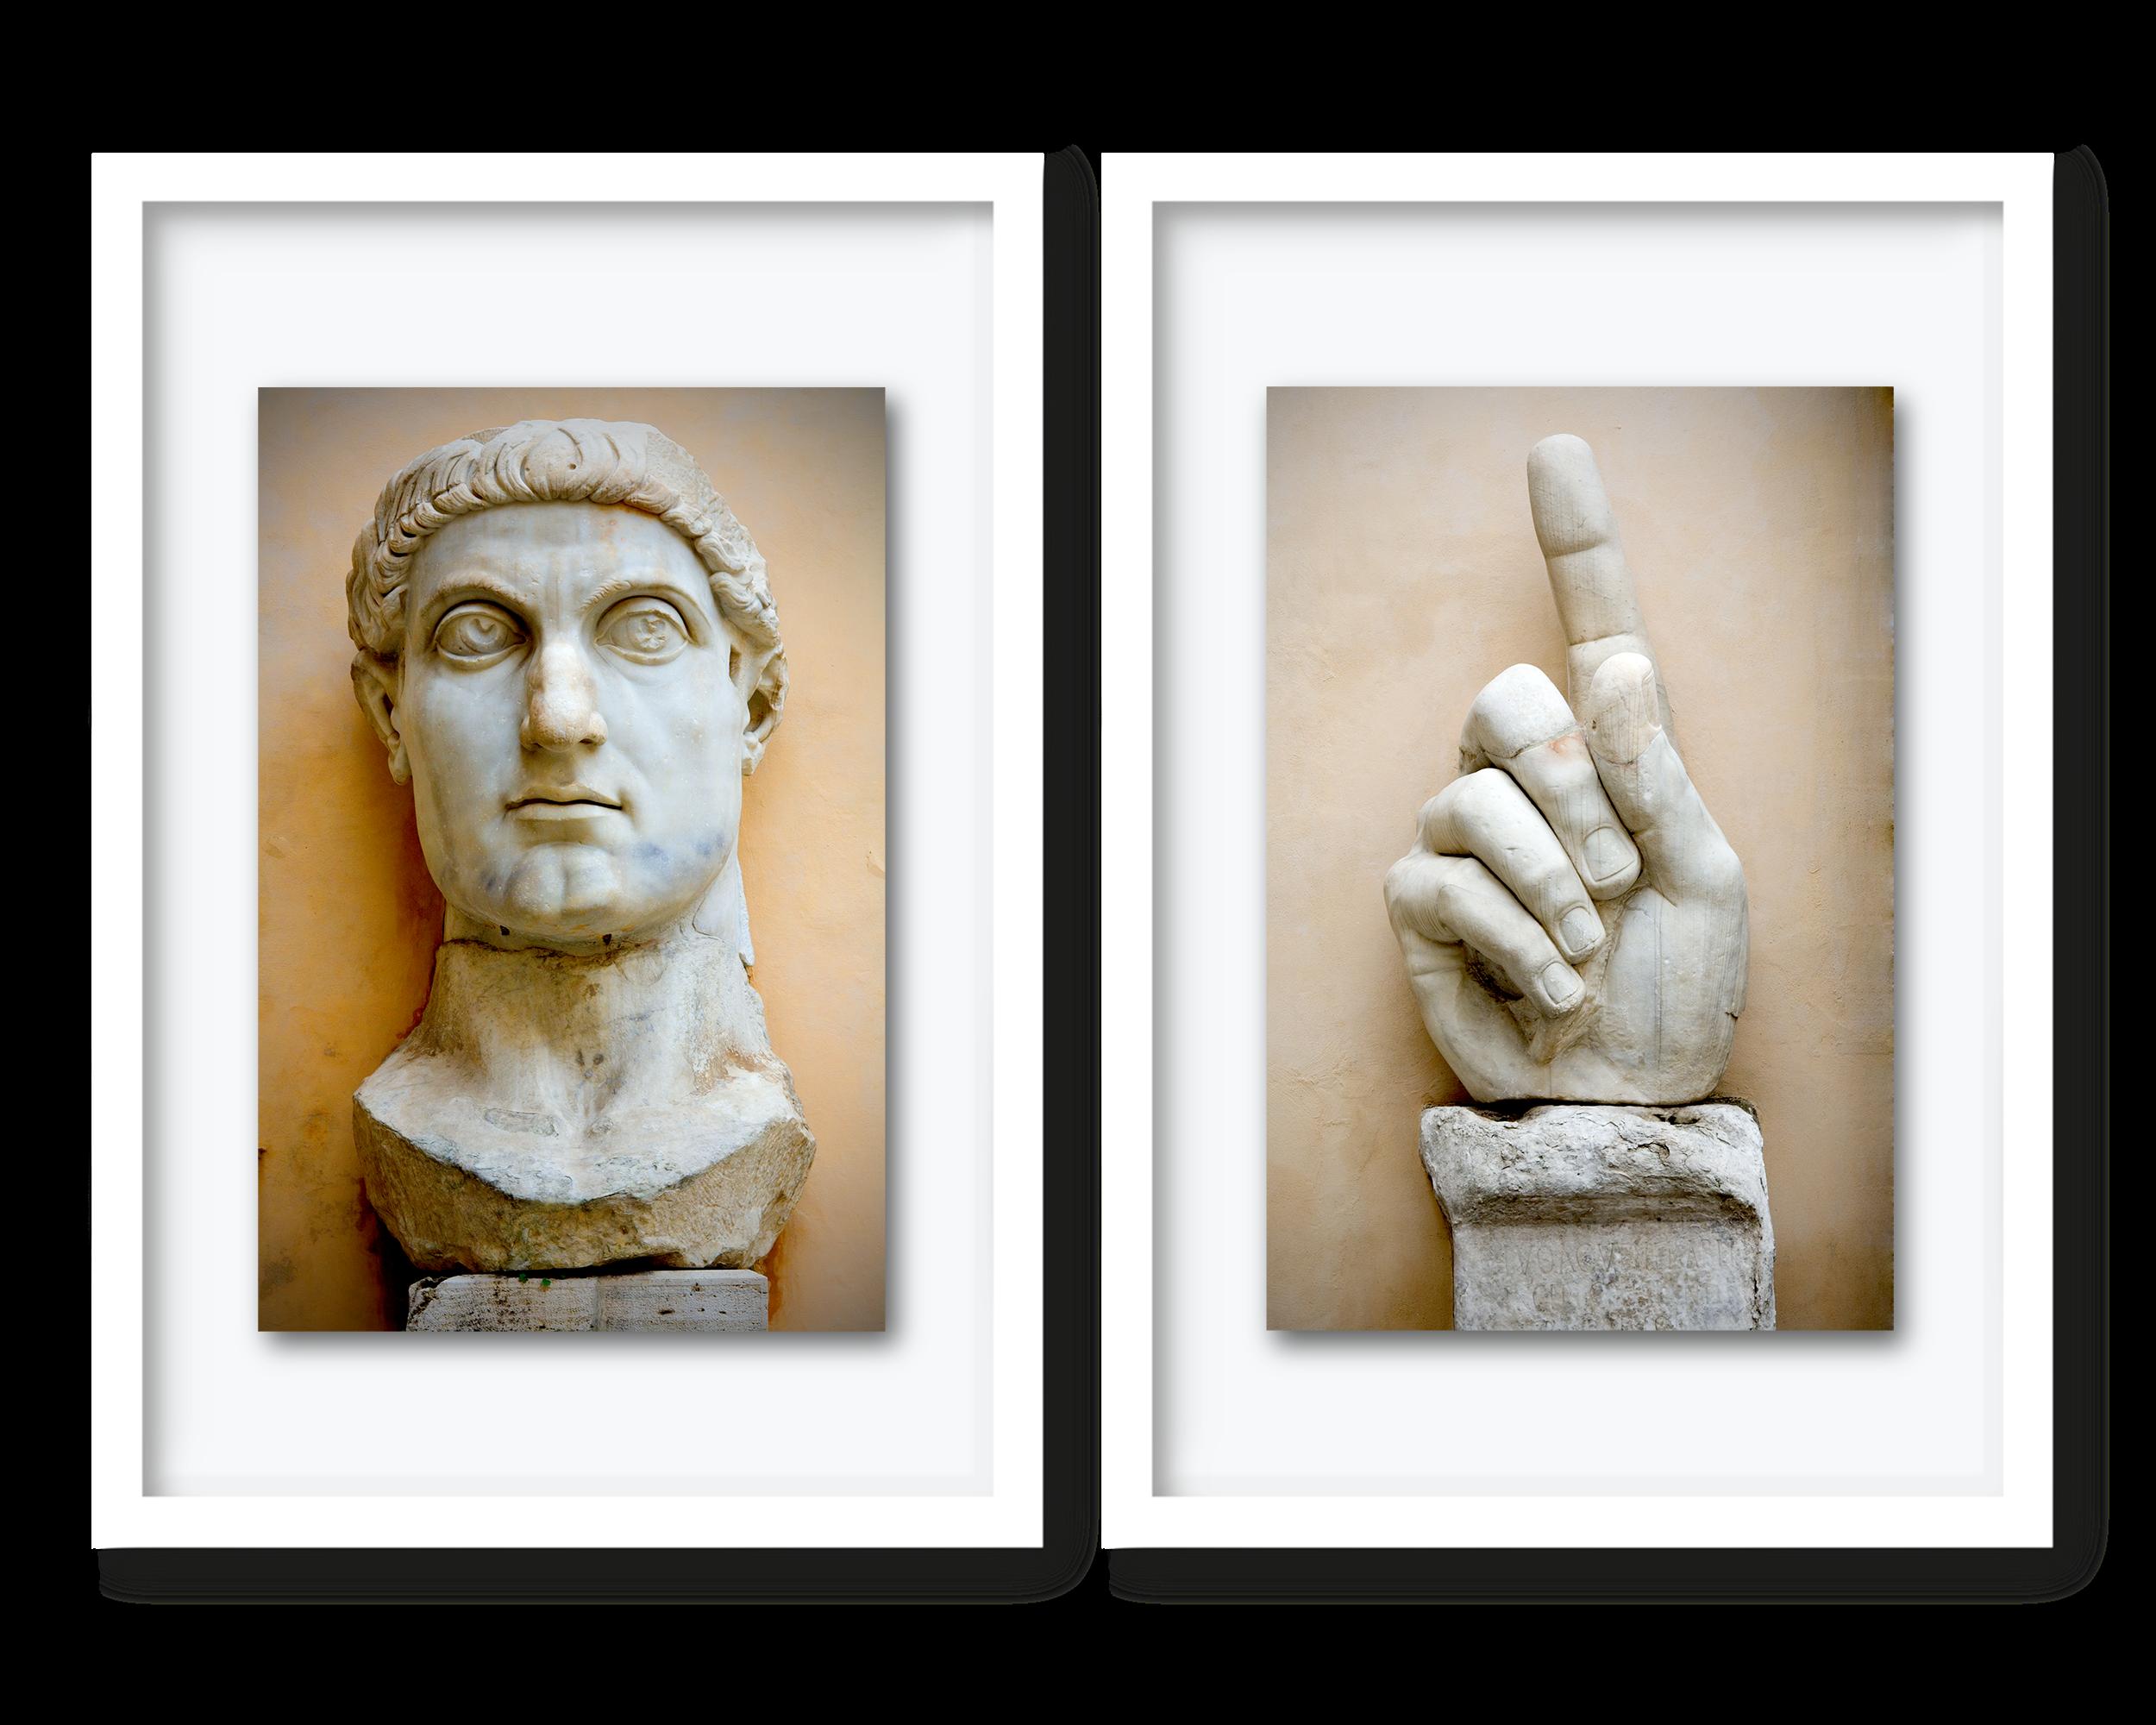 37david-pearce-emperor-constantine.png